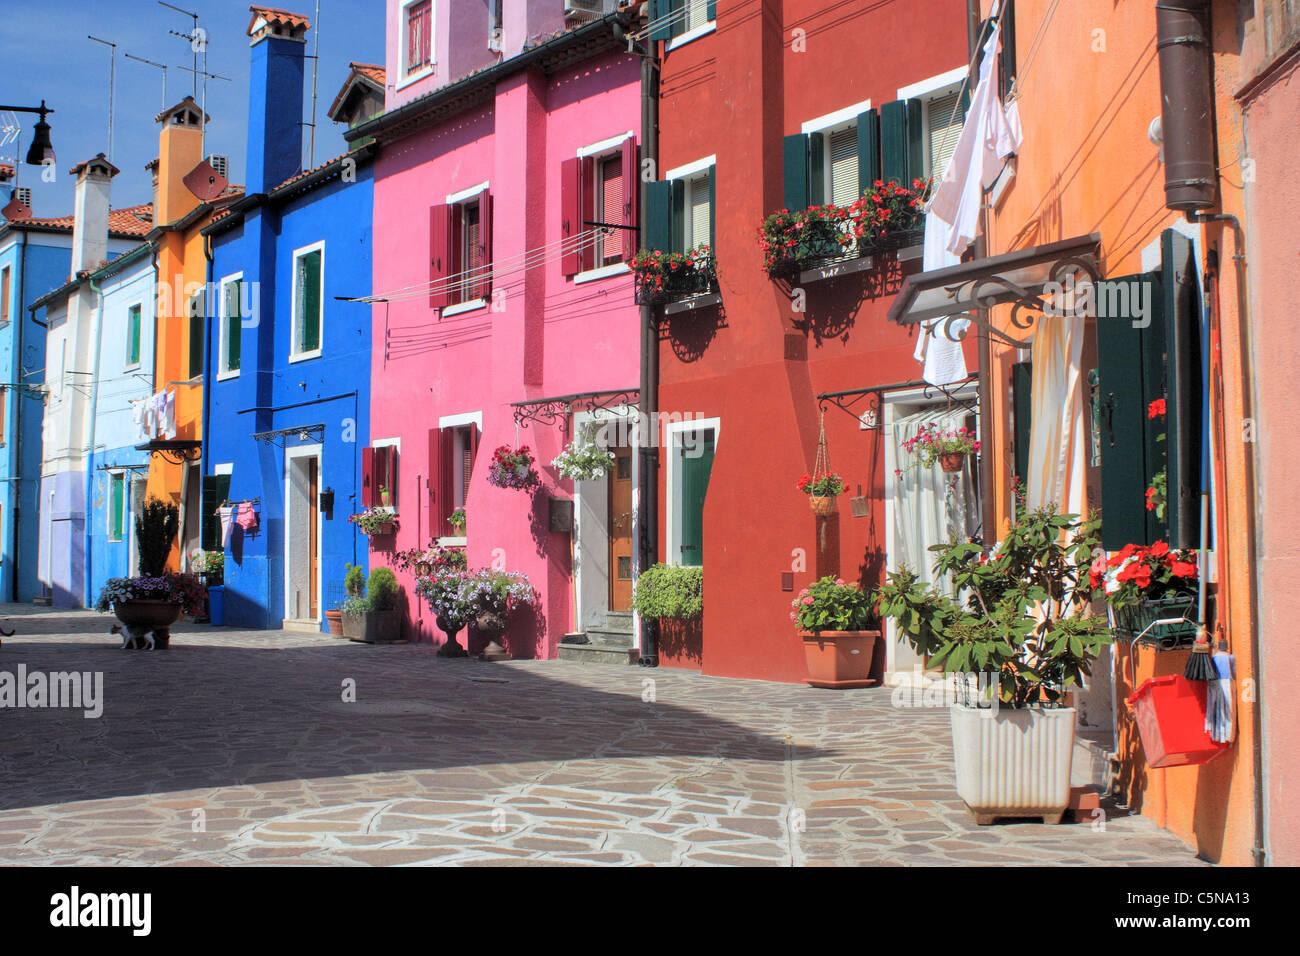 Häuser Italien bunte häuser in burano insel venedig italien stockfoto bild